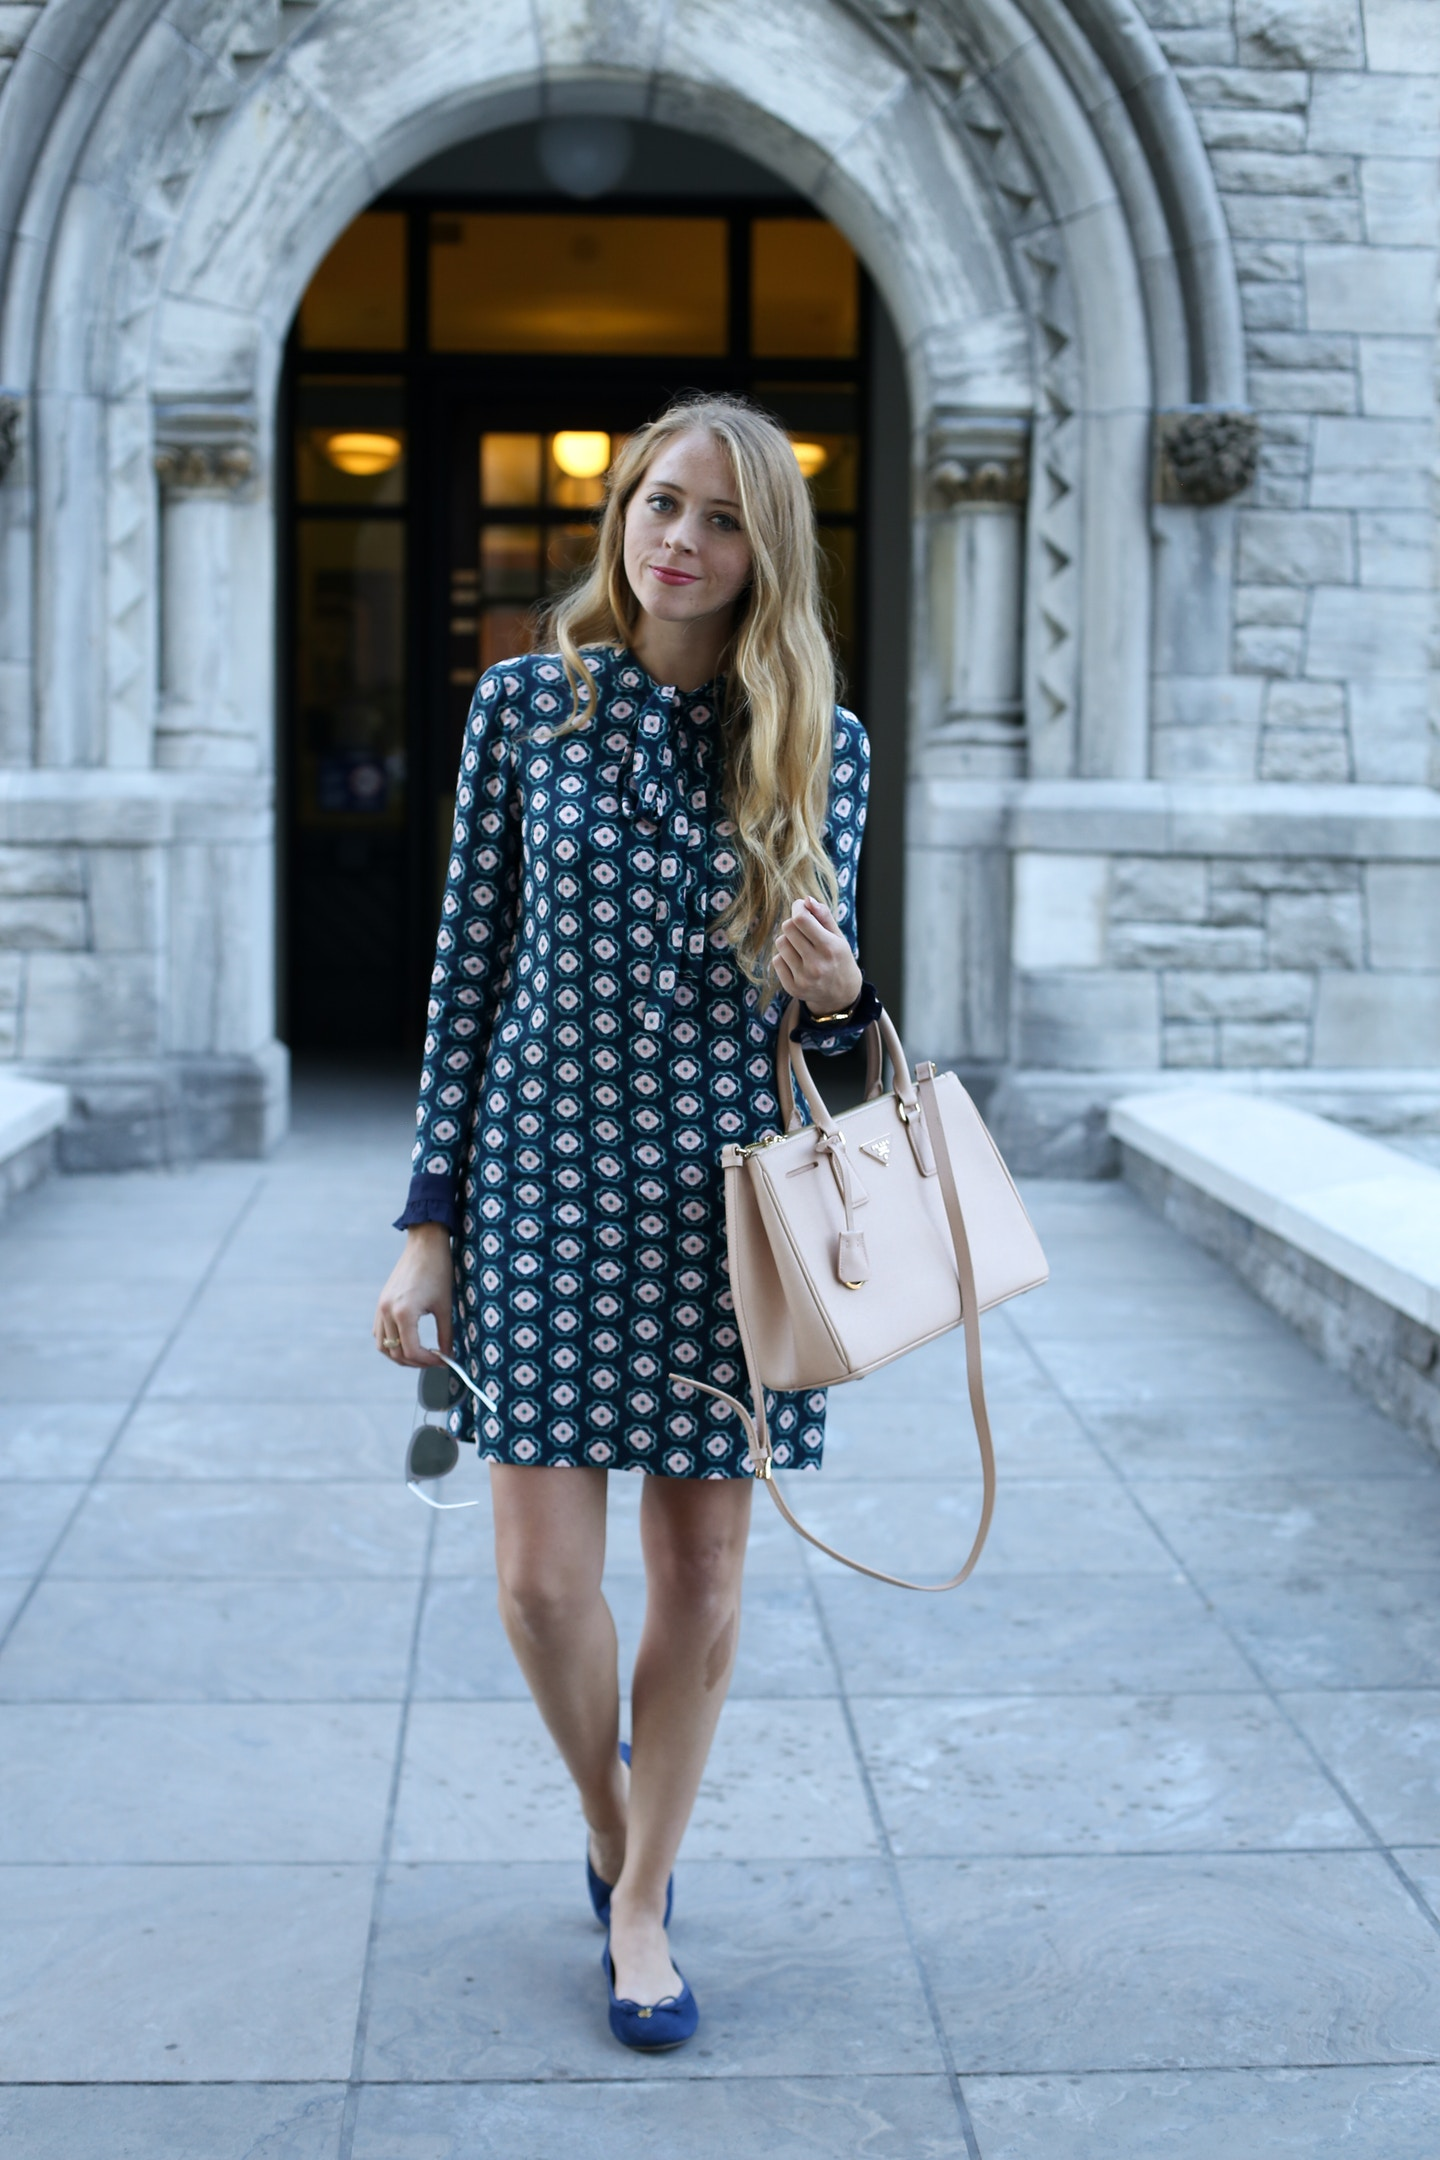 Work Wear Wednesday: Patterned Bow Neck Dress